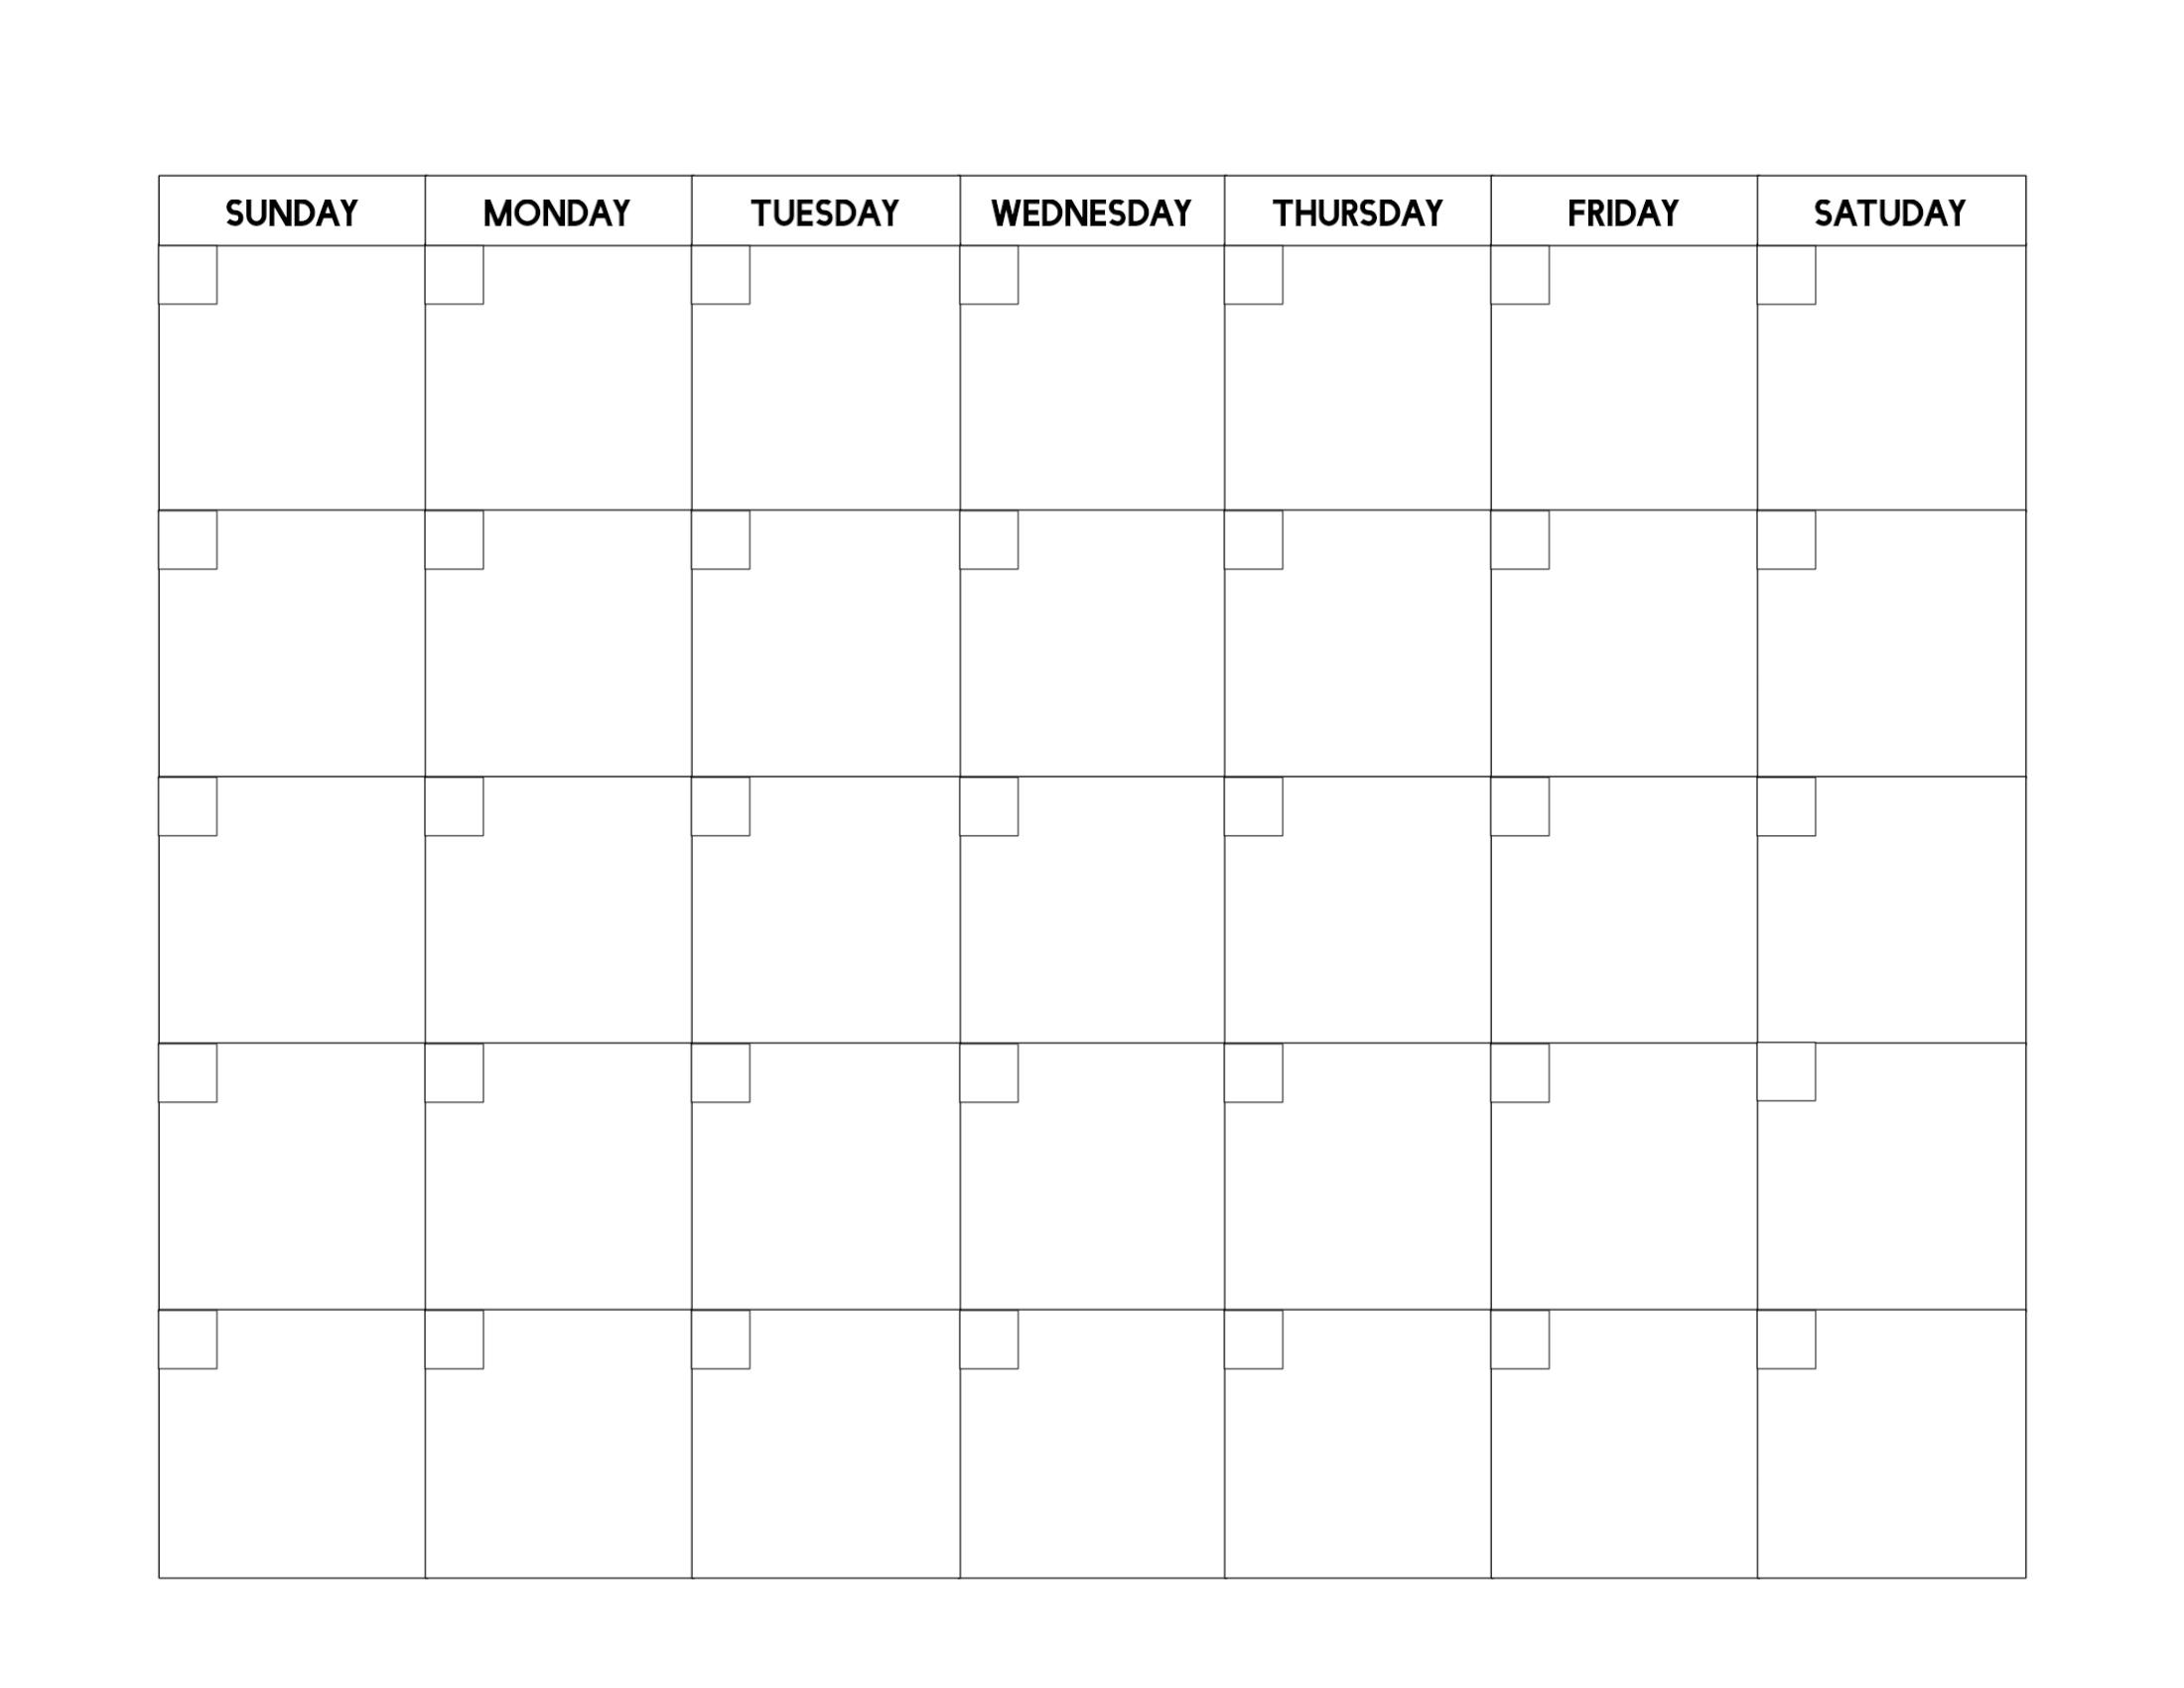 Free Printable Blank Calendar Template - Paper Trail Design with Printable Blank Calendar Template